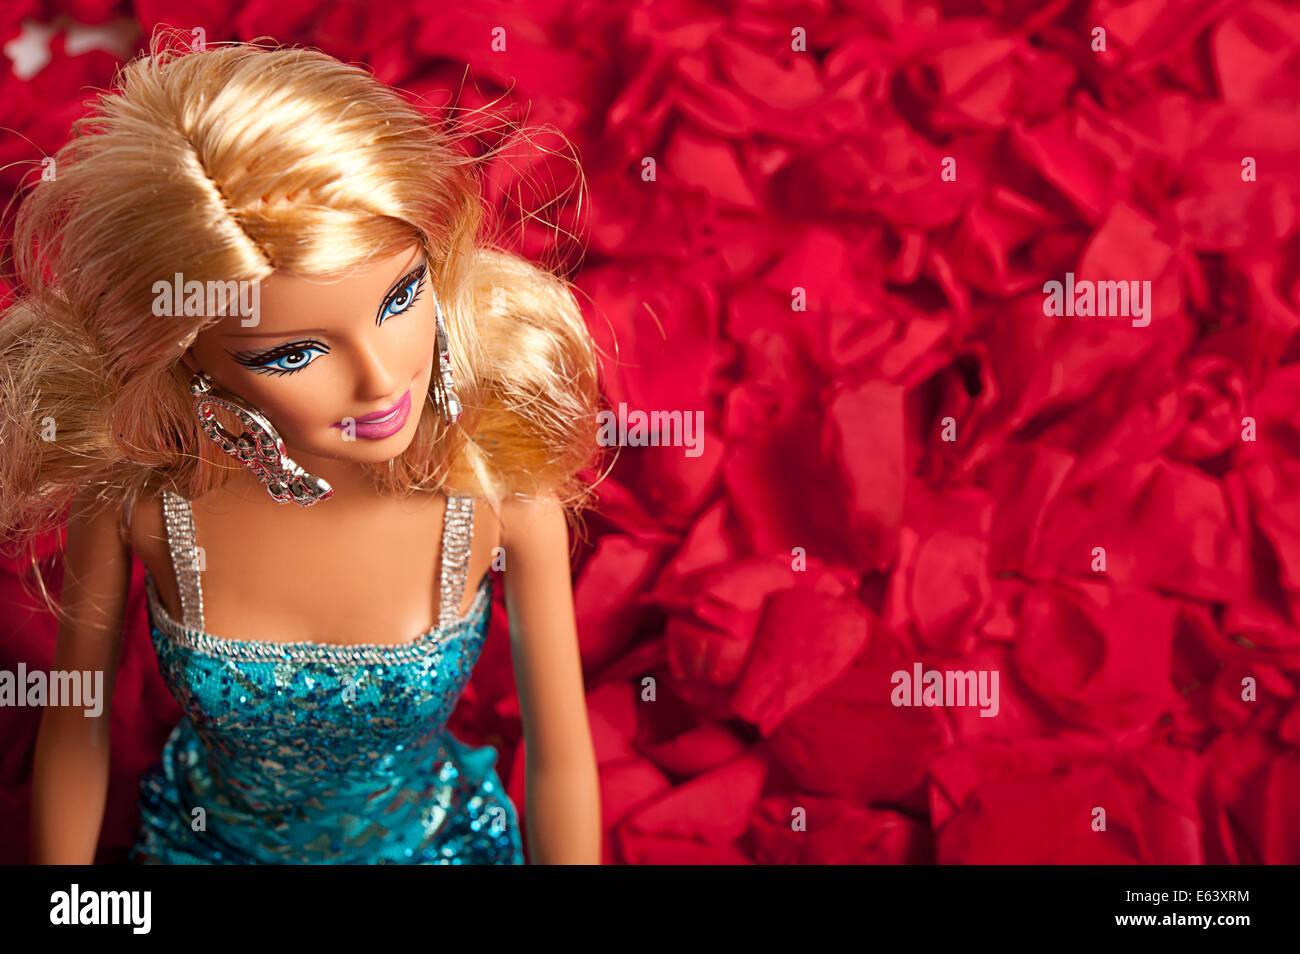 Barbie doll o - Stock Image